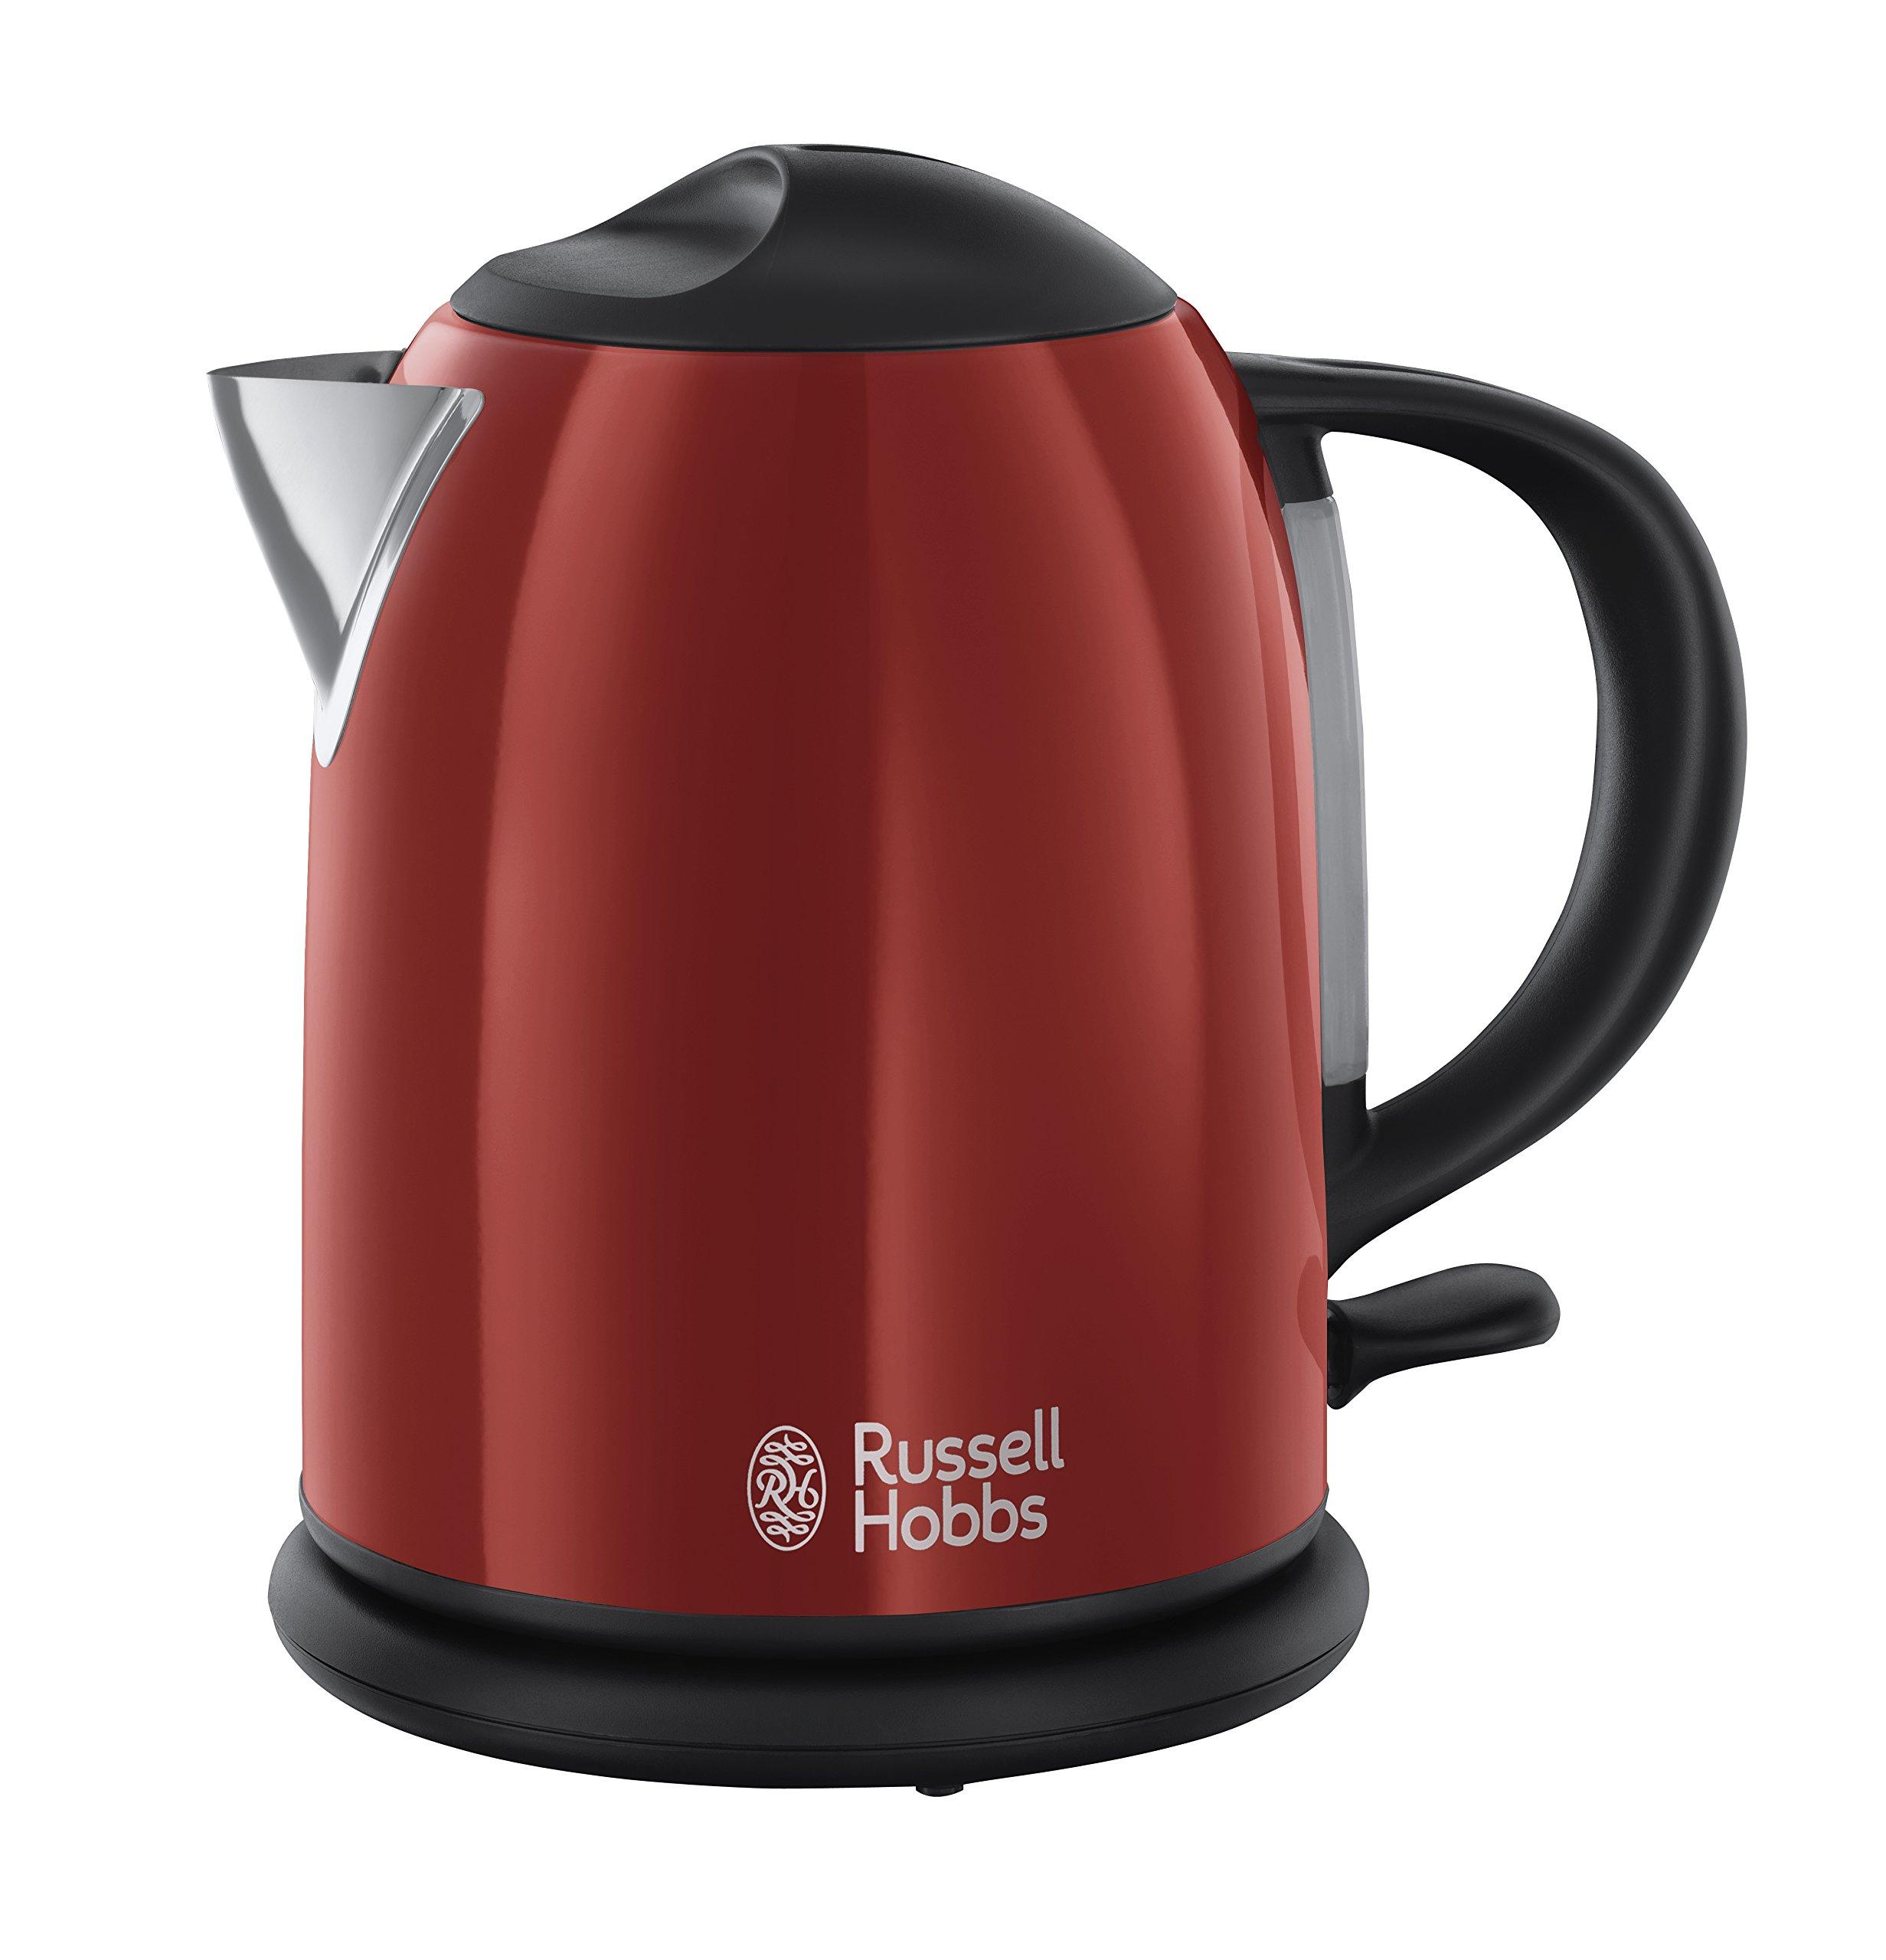 Russell Hobbs Colours Red – Hervidor de agua compacto, 1L, resistencia oculta, 2200 W, acero inoxidable color rojo – ref. 20191-70